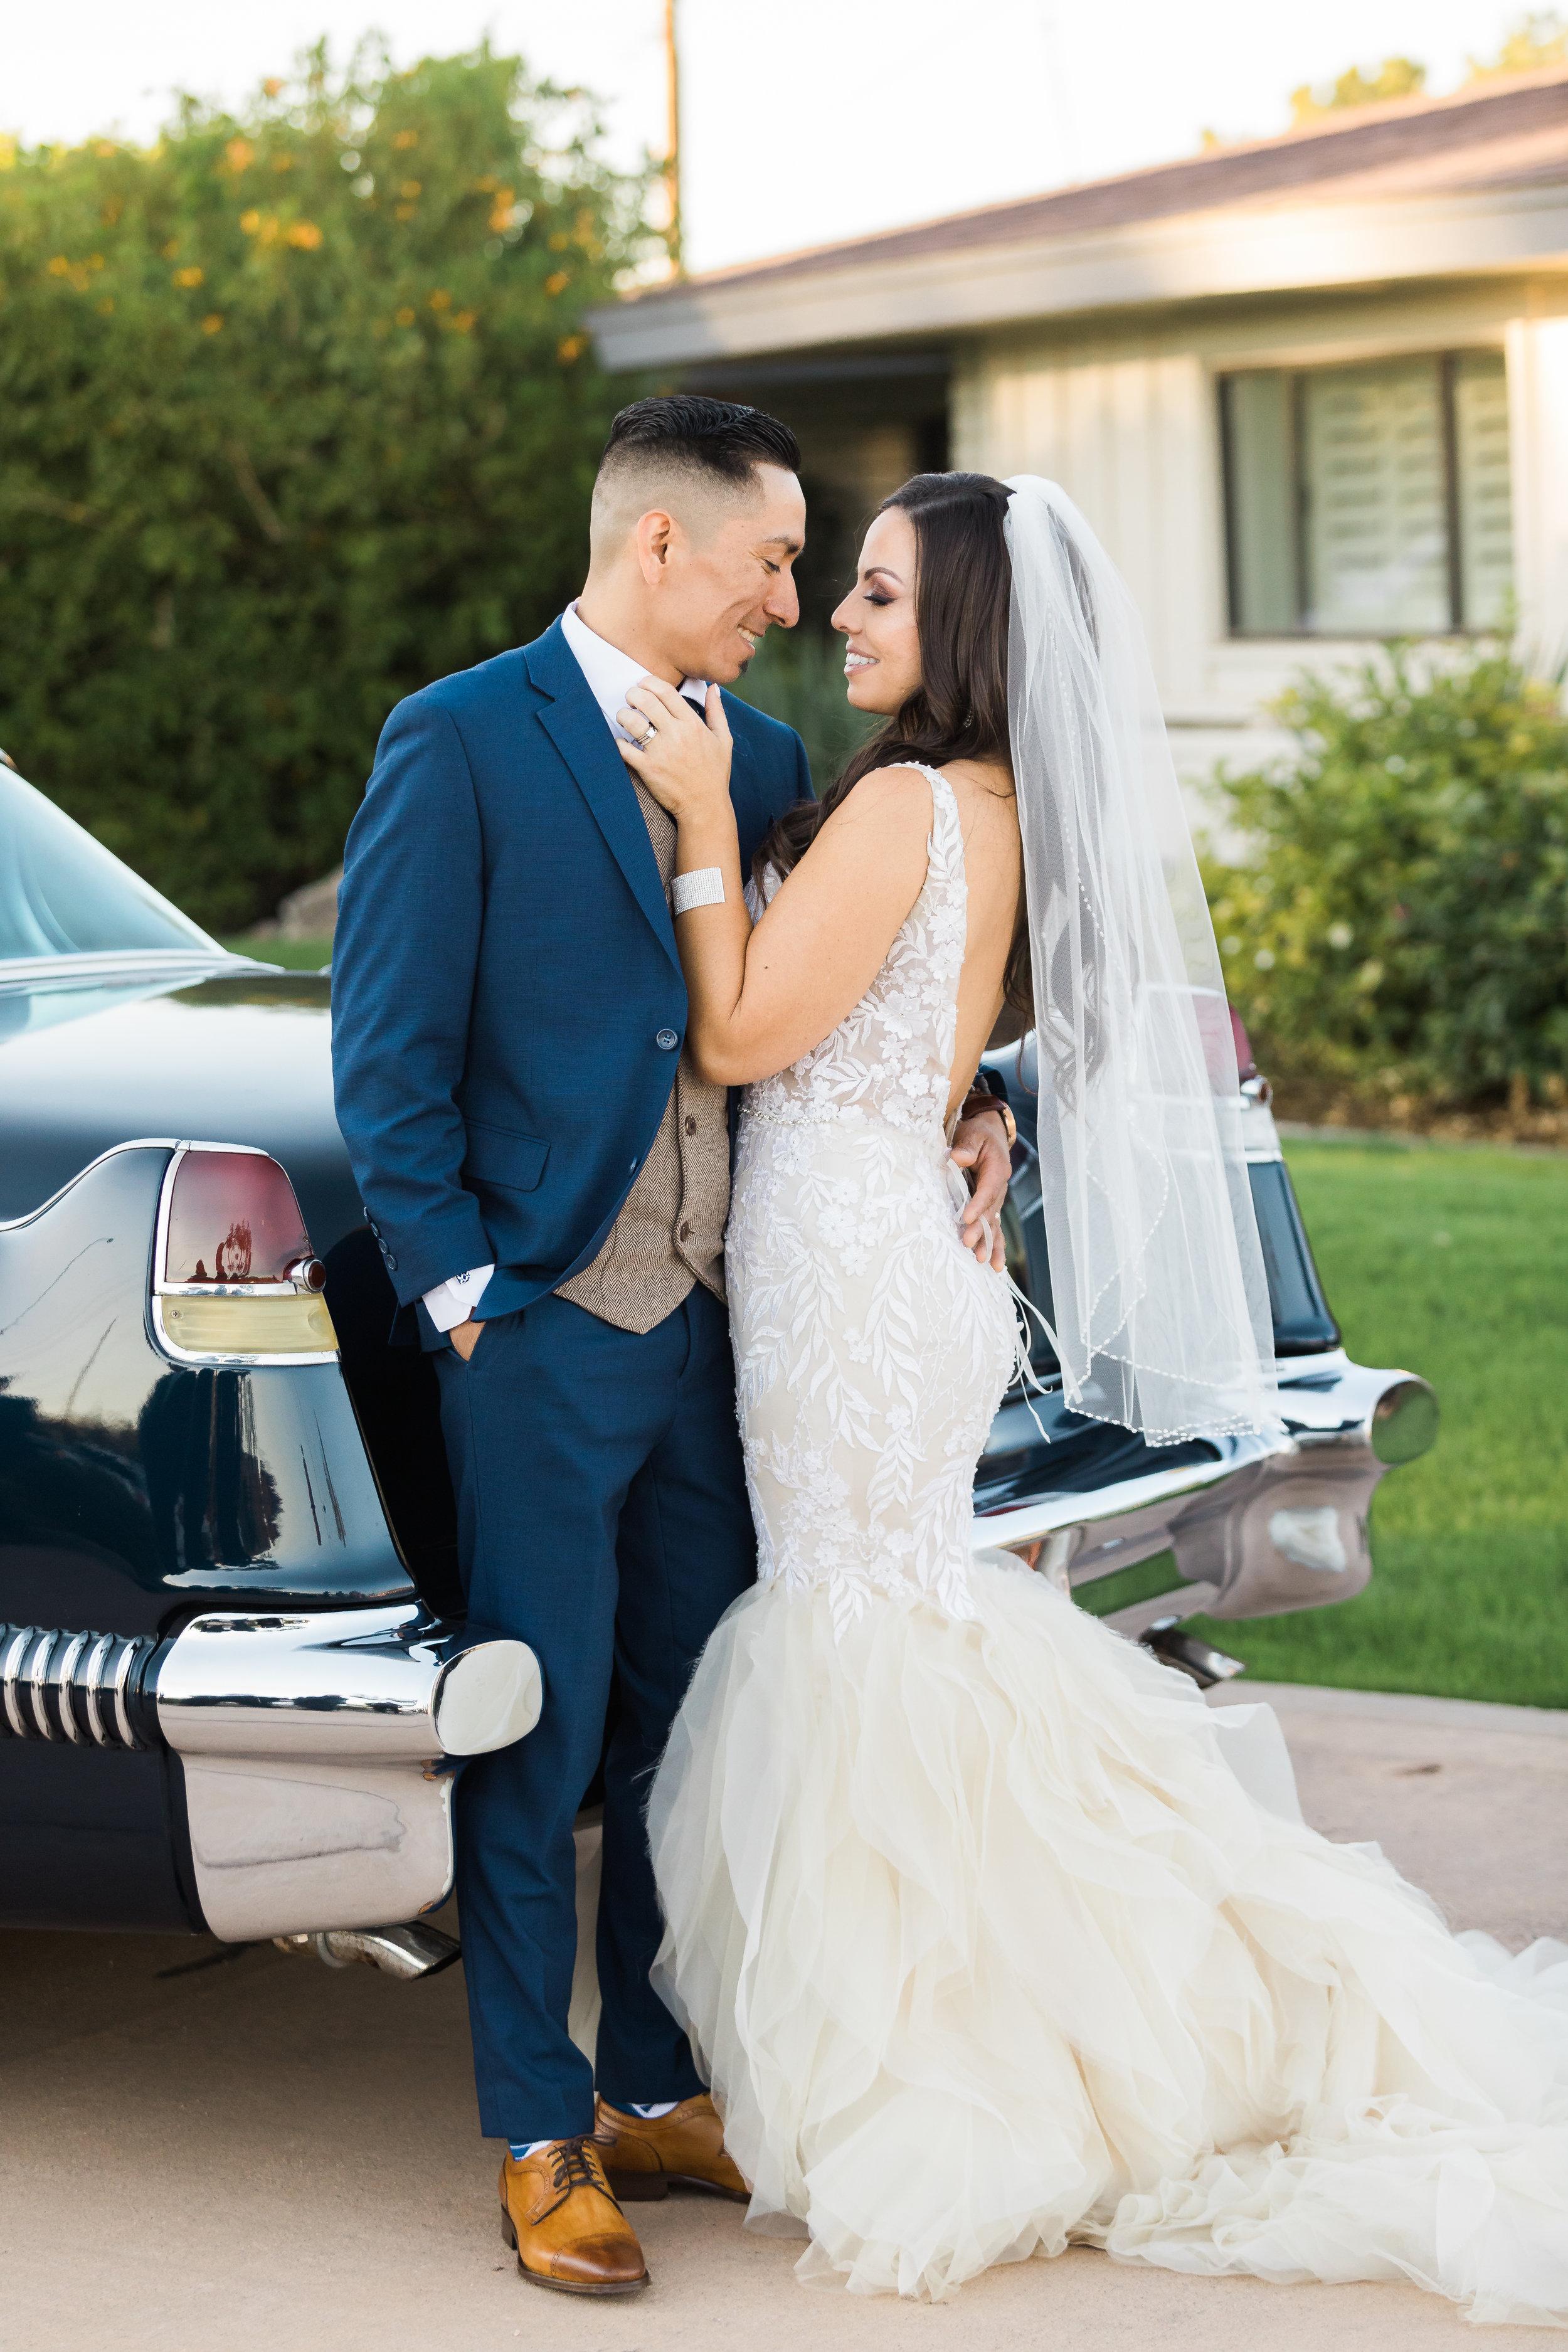 Gather-Estate-Wedding-Mesa-Arizona-Tara-Nichole-Photo-14.jpg